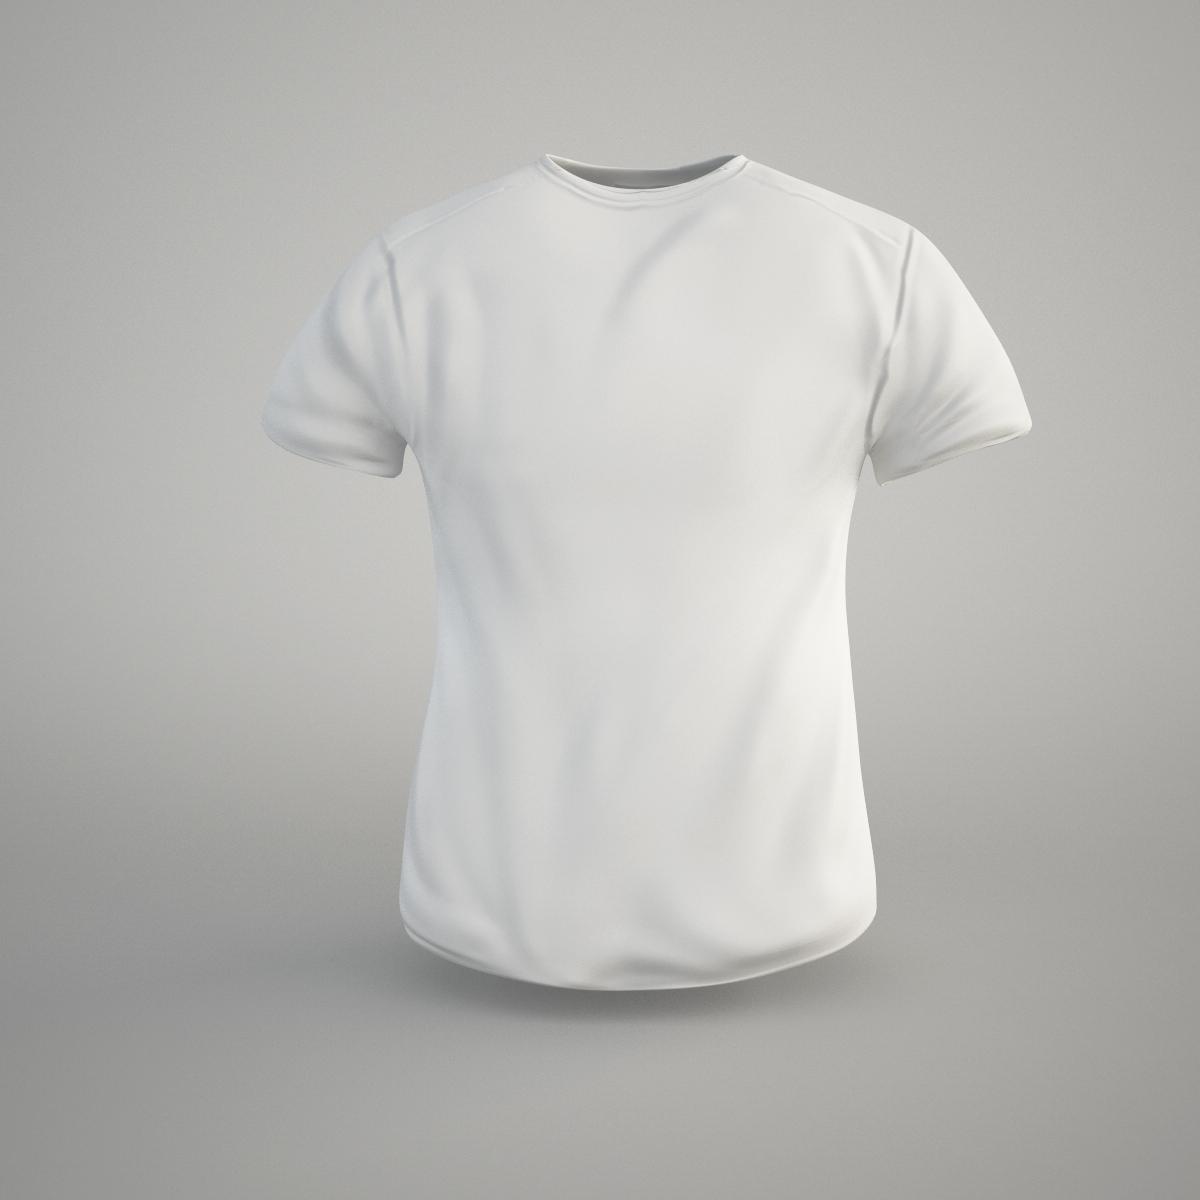 T-shirt 3D Model Game ready .obj .fbx